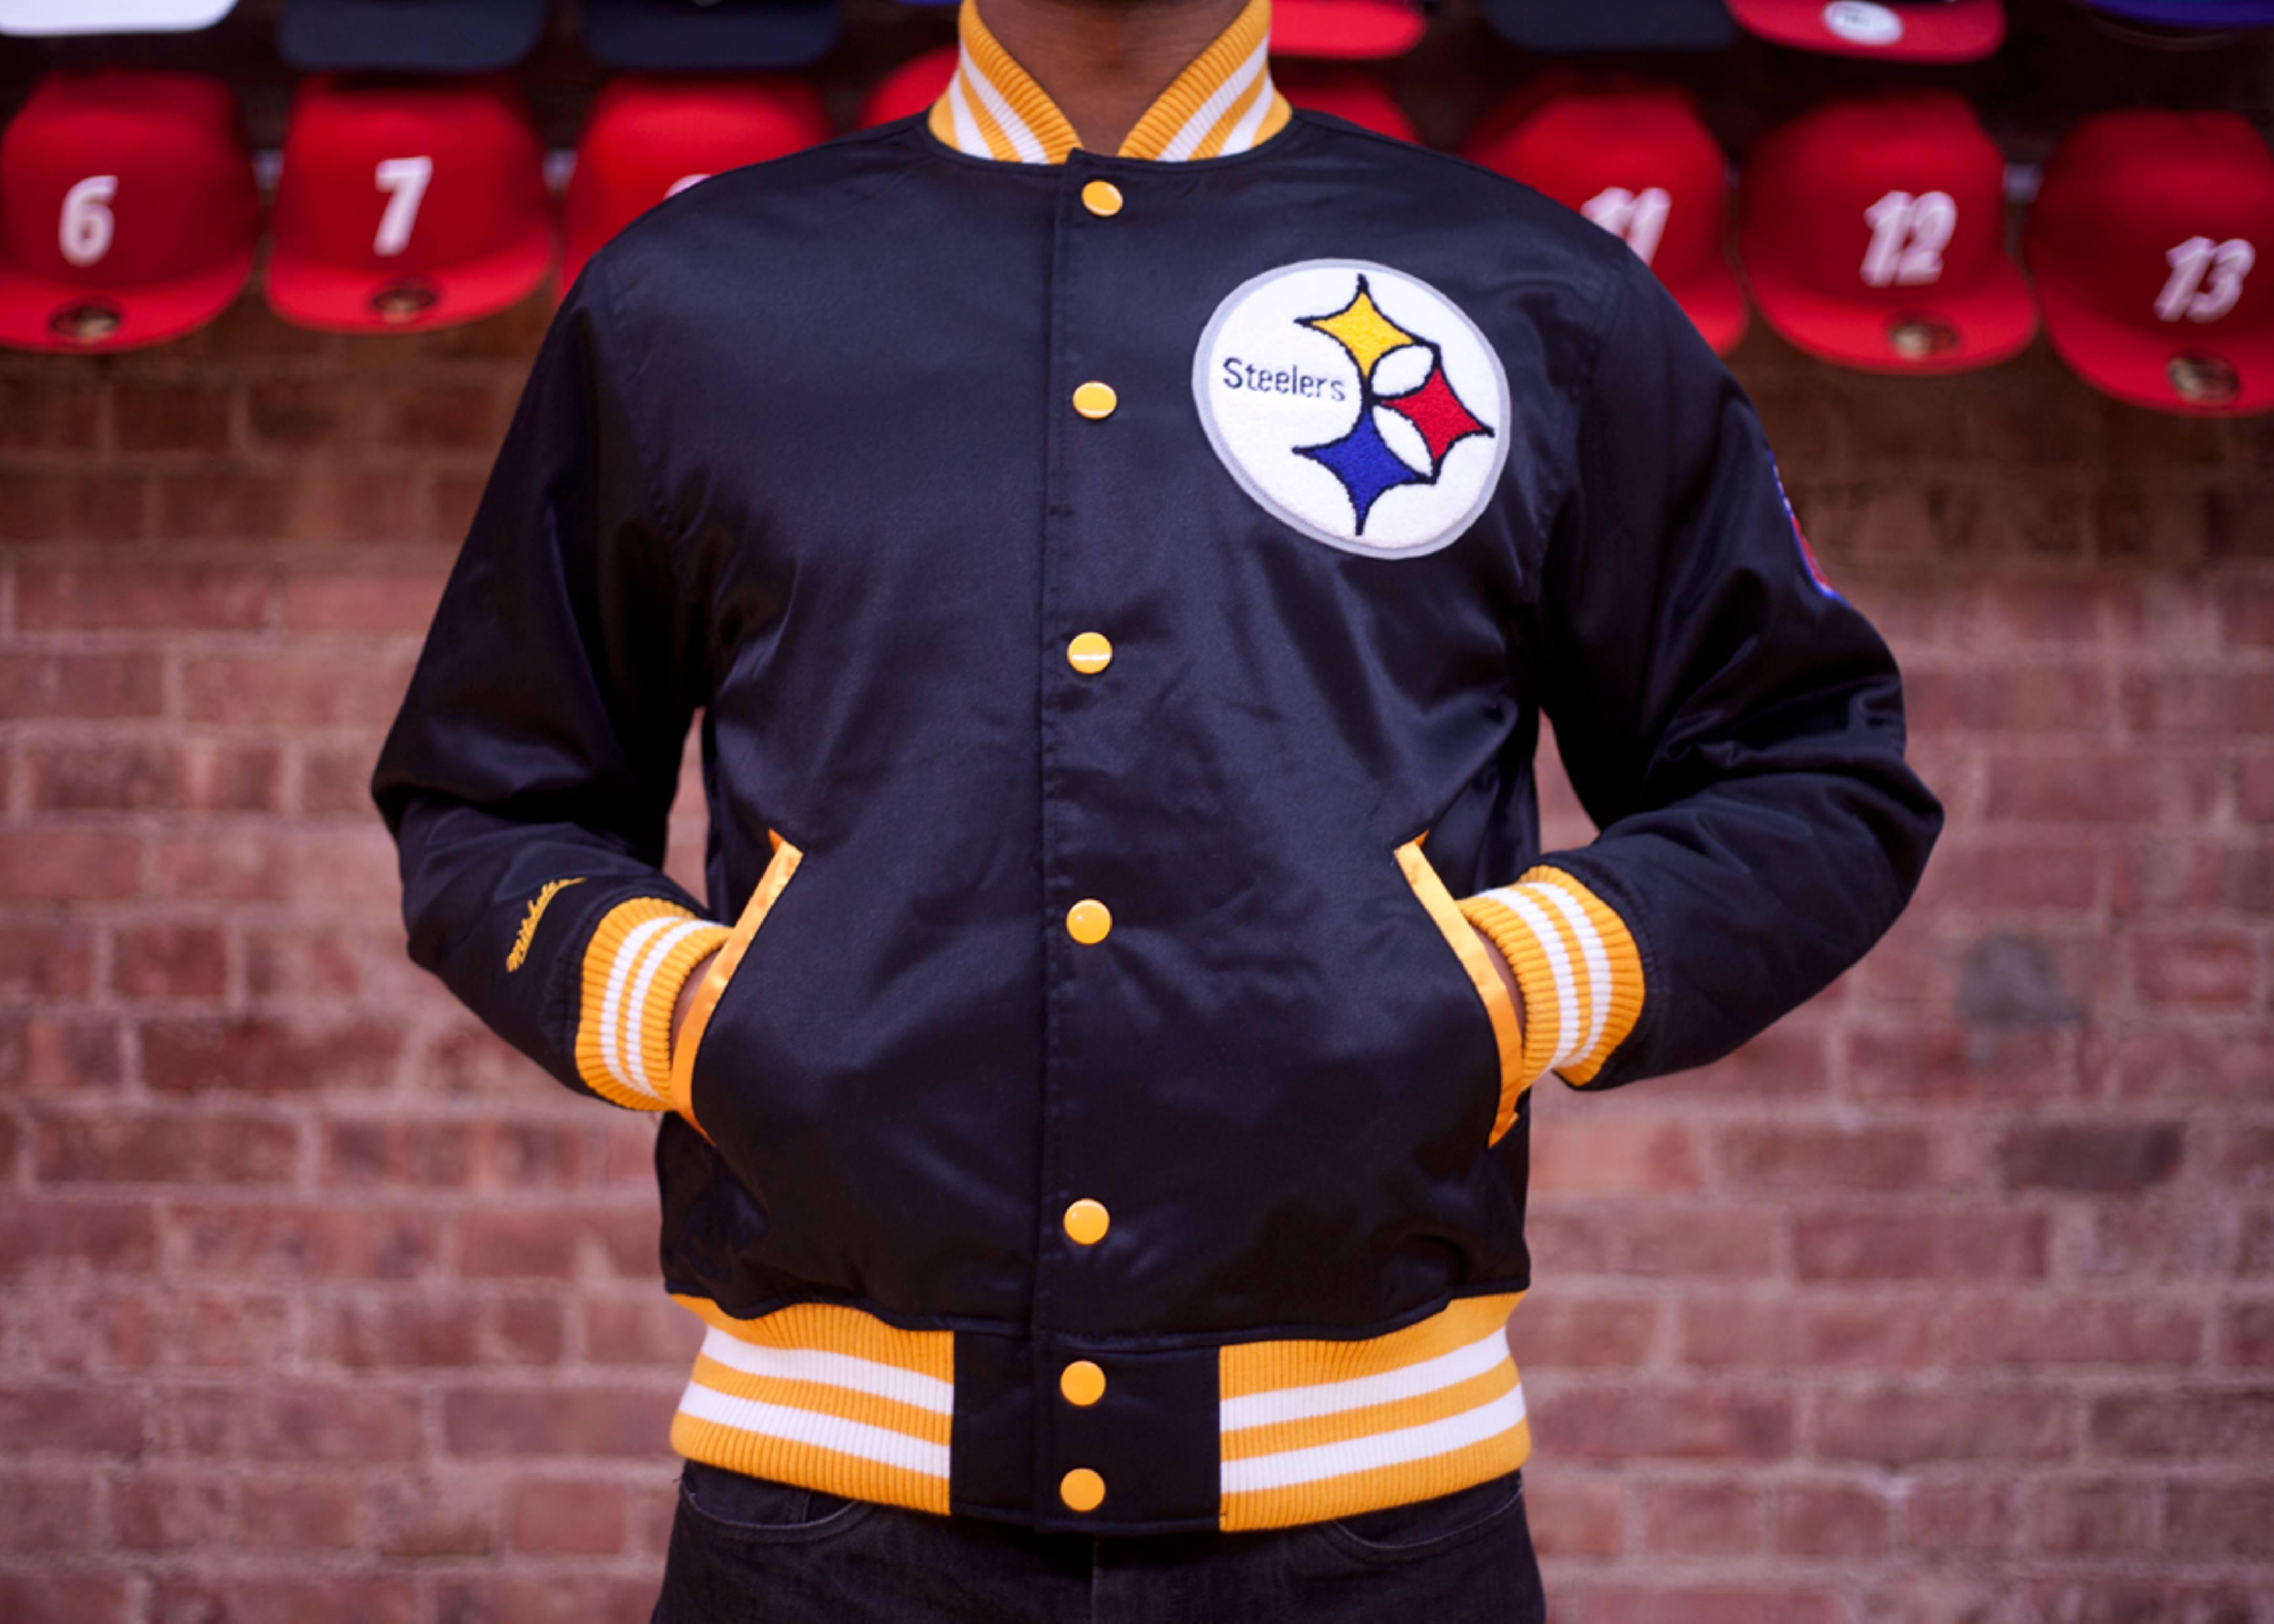 pittsburgh steelers nfl satin jacket